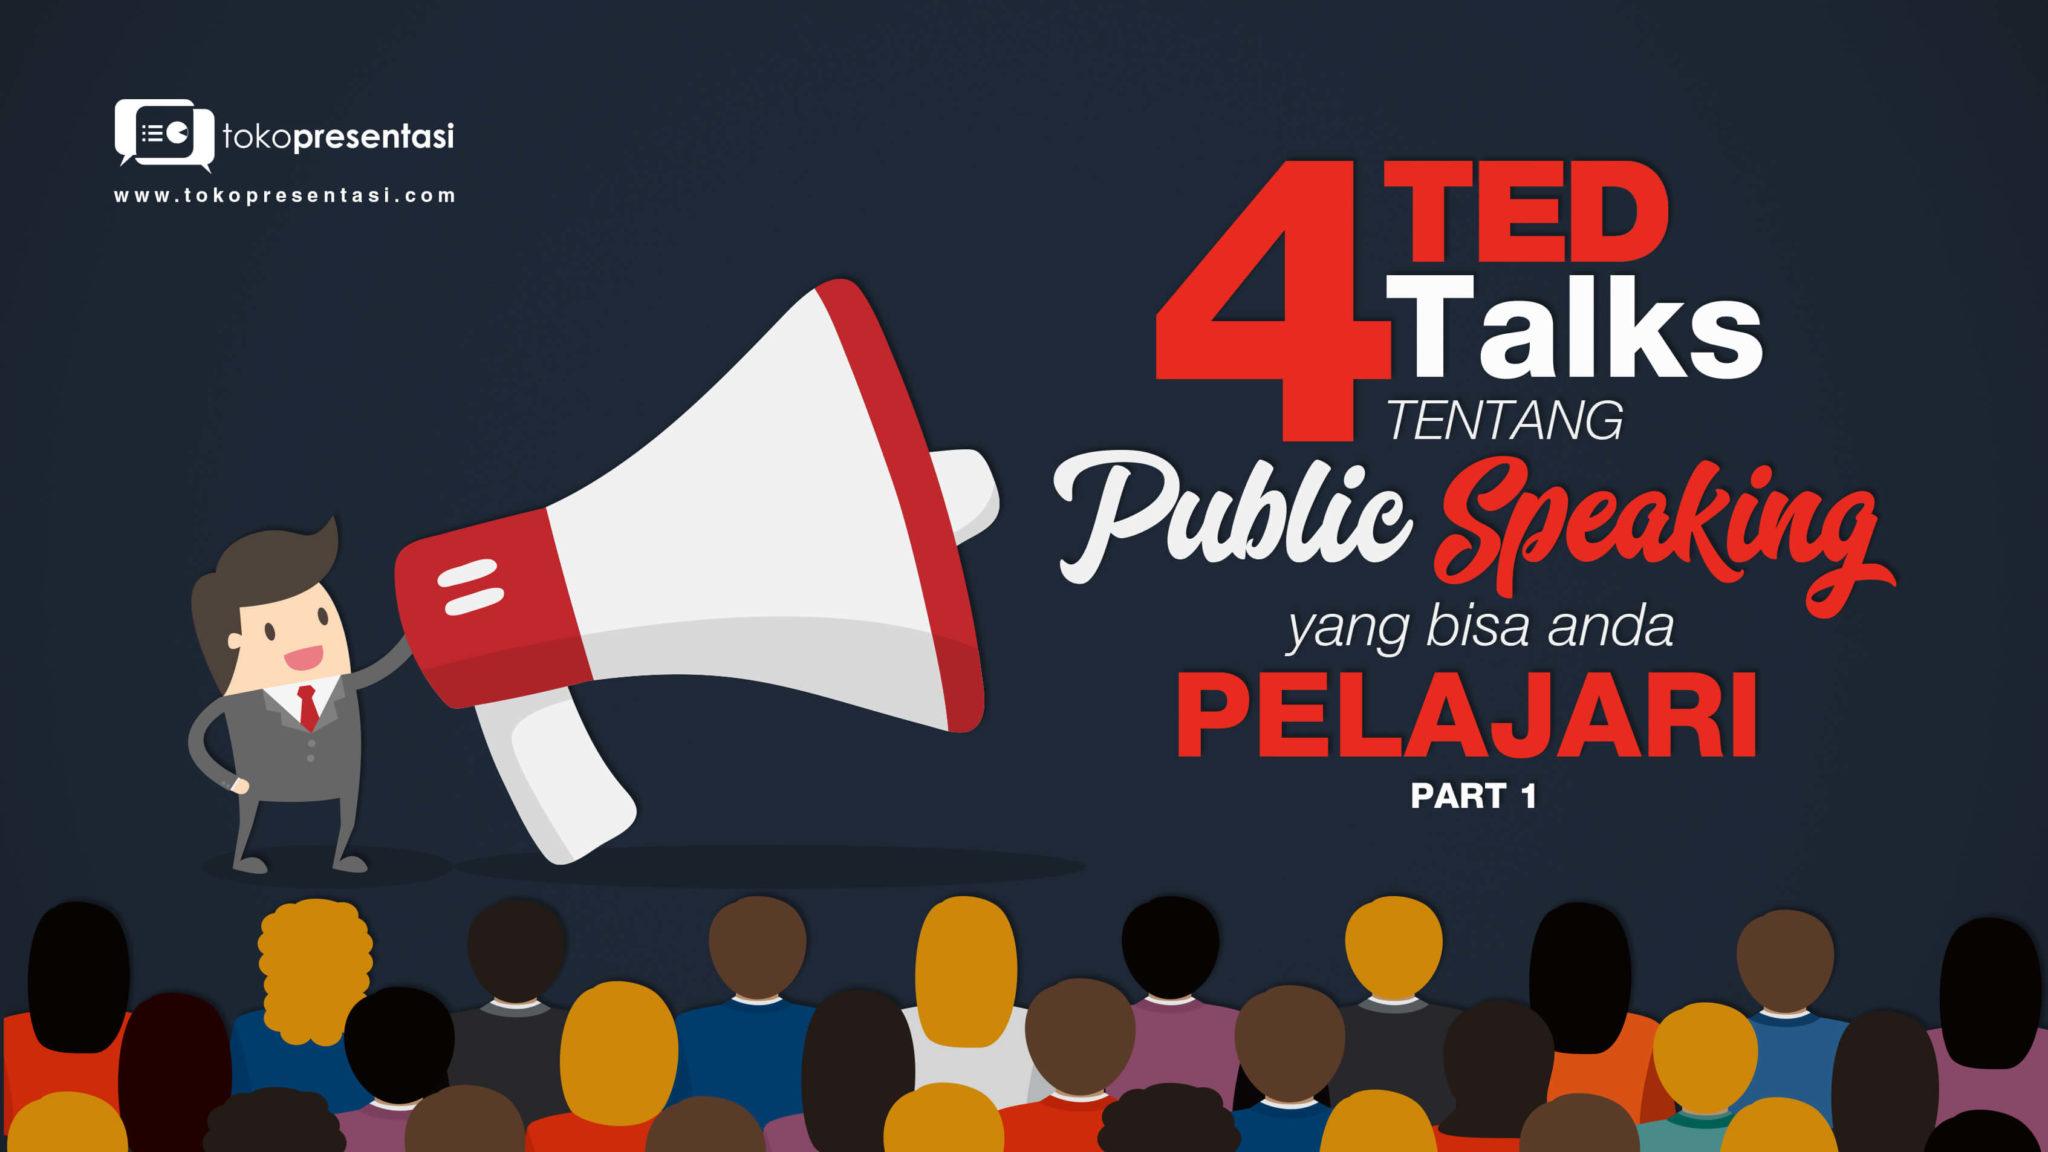 Training presentasi Tips presentasi 4 TED Talk tentang Publik Speaking tokopresentasi.com